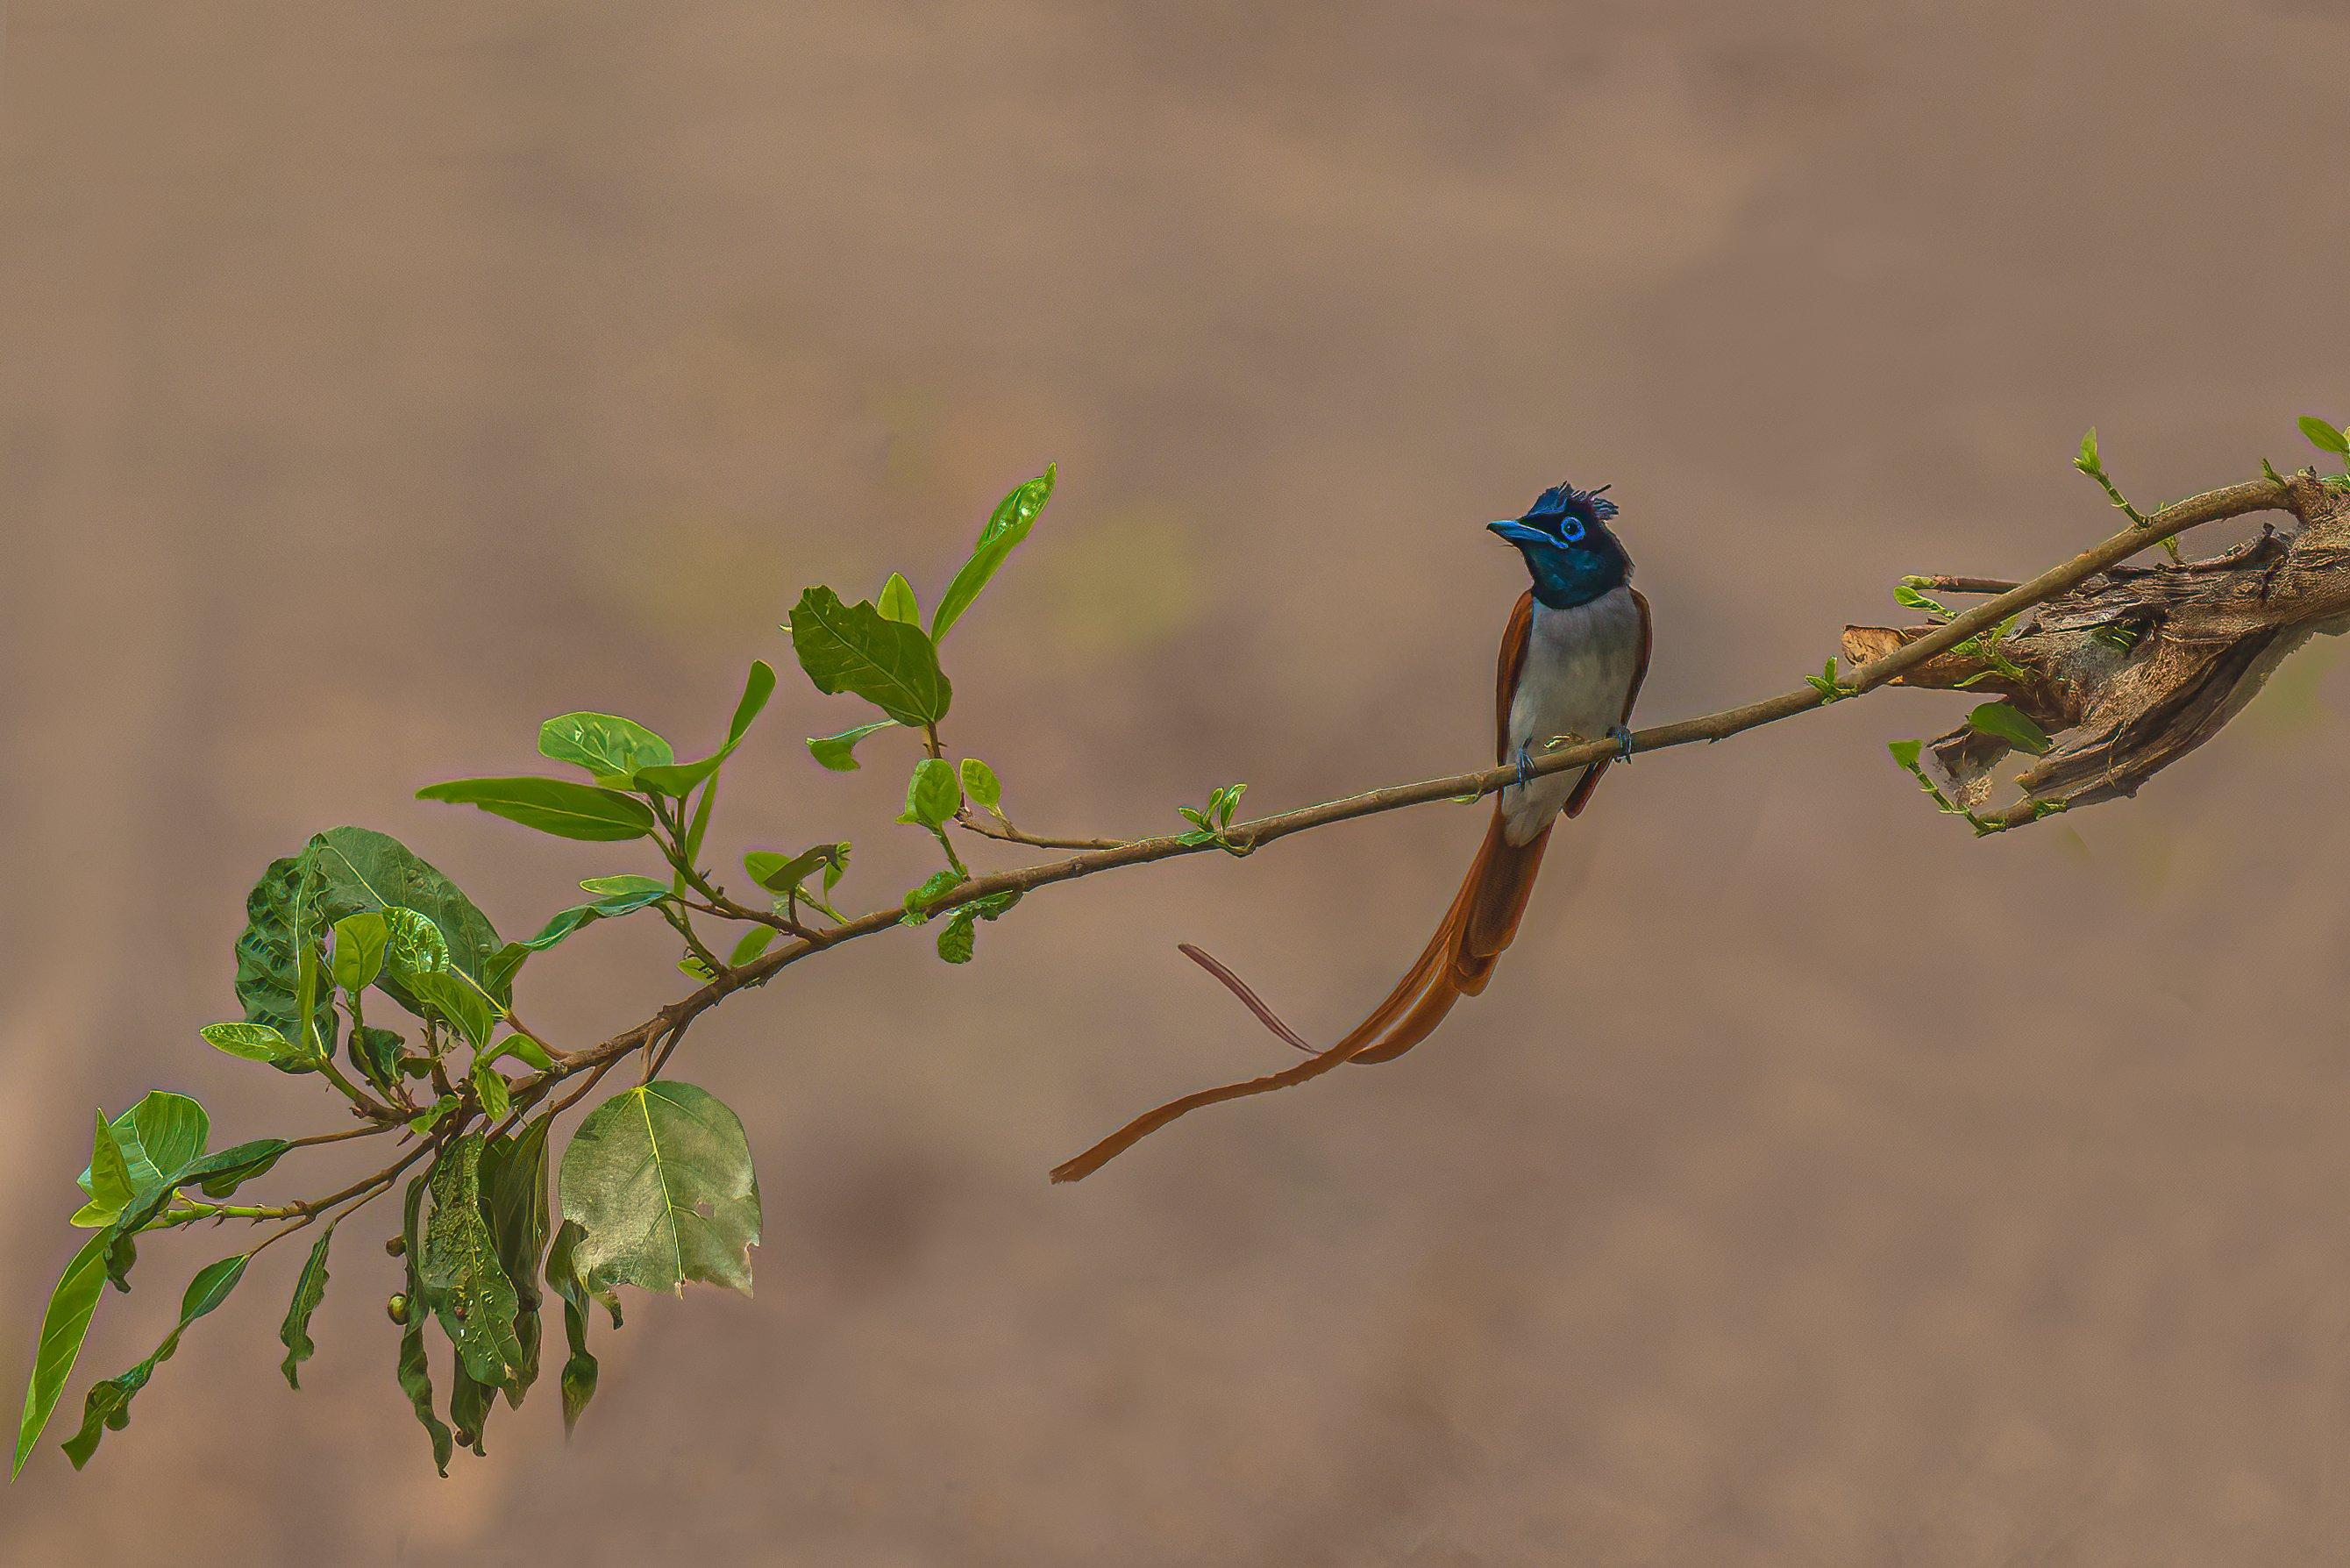 #bird, Saxena Vipul